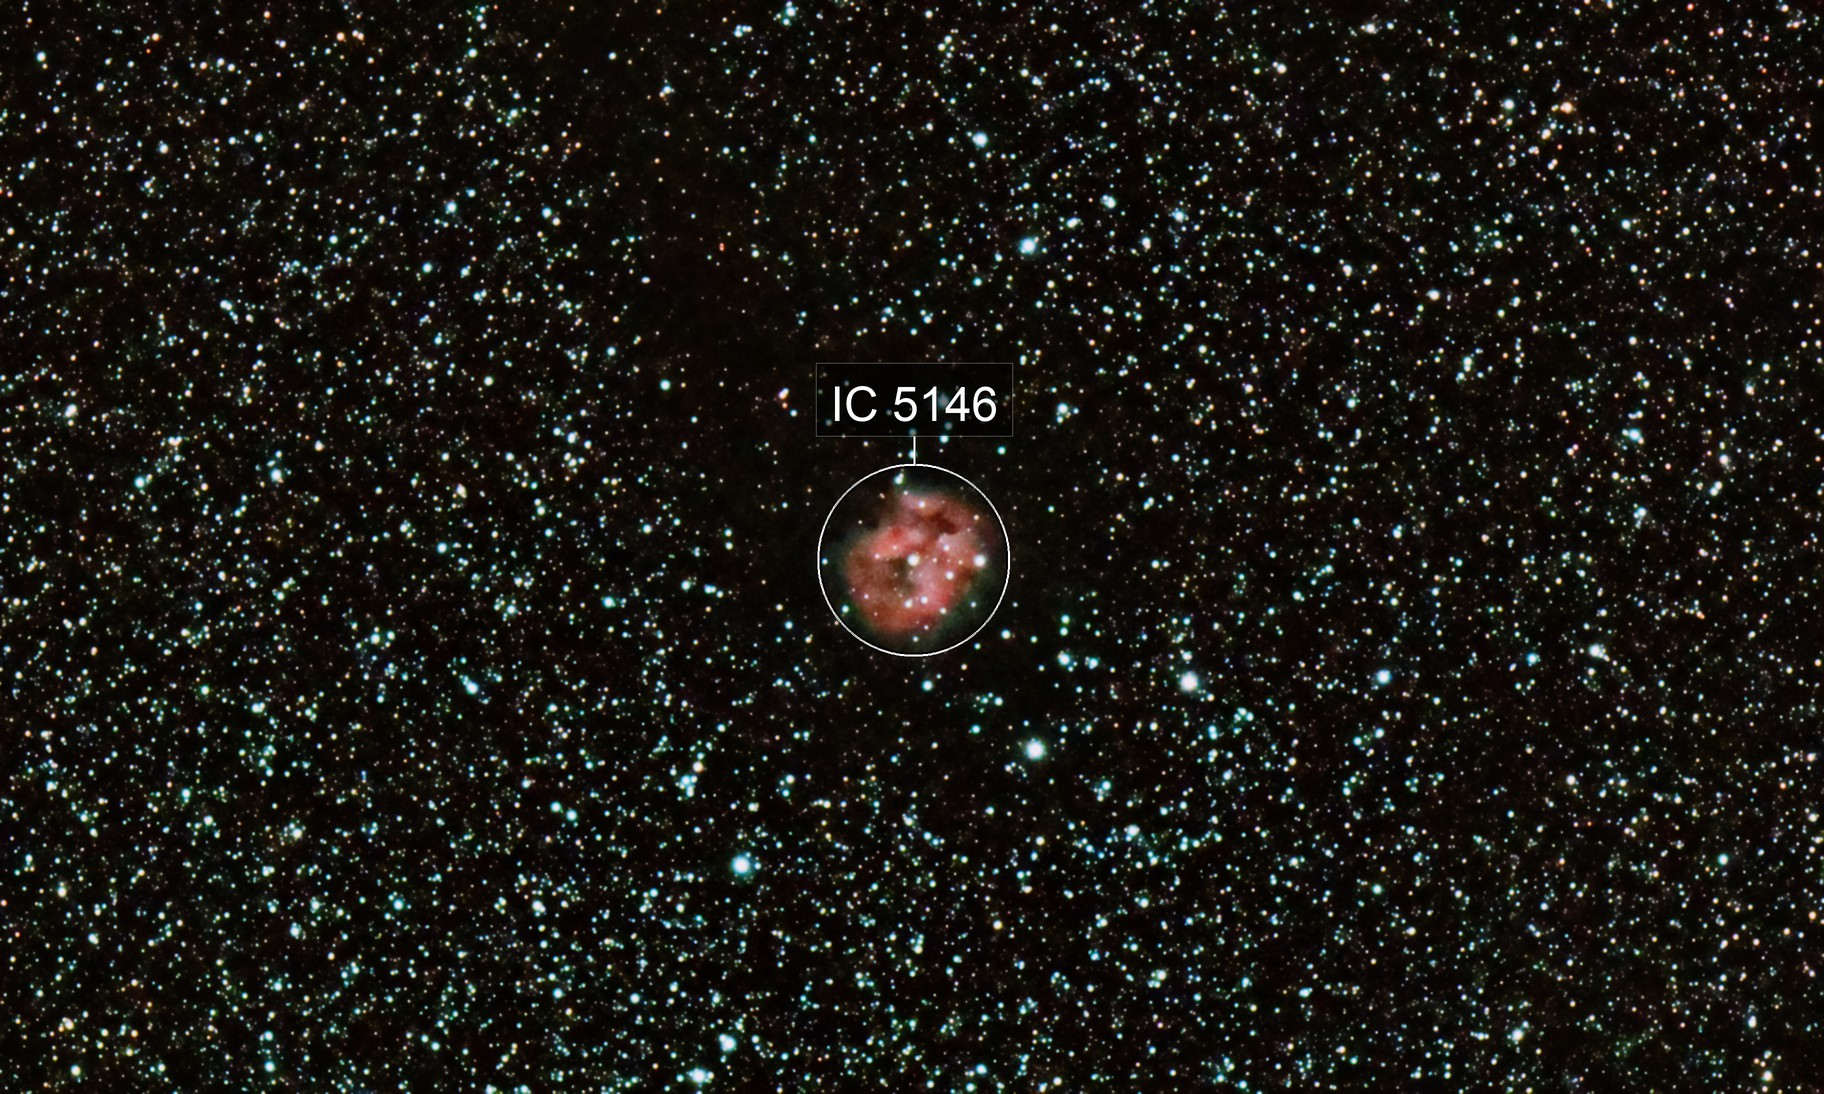 C19 Cocoon Nebula